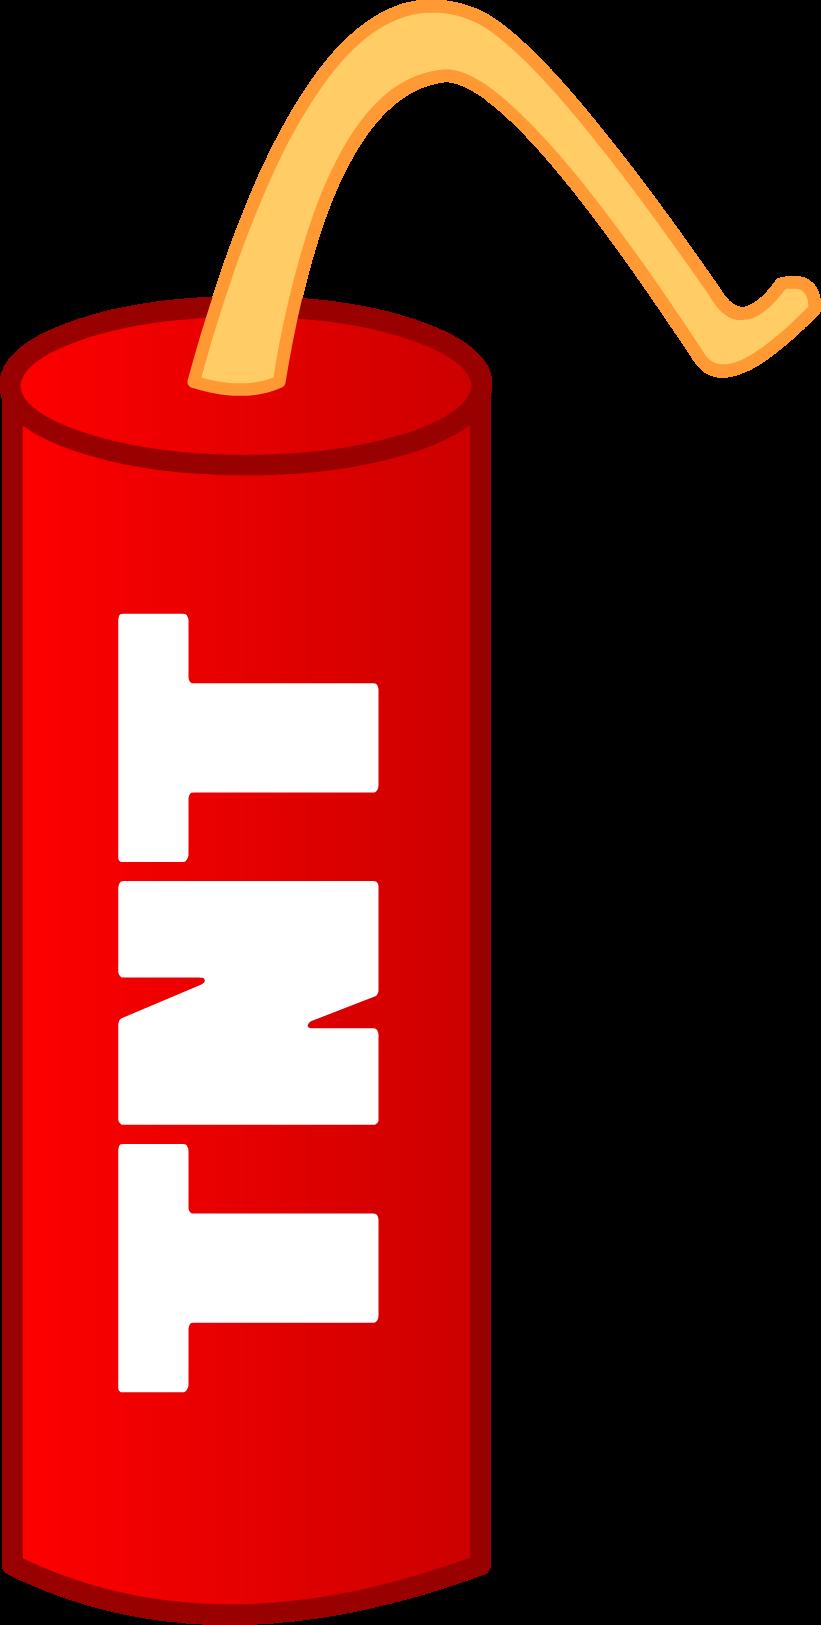 Eraser clipart object. Minecraft wikia clip art